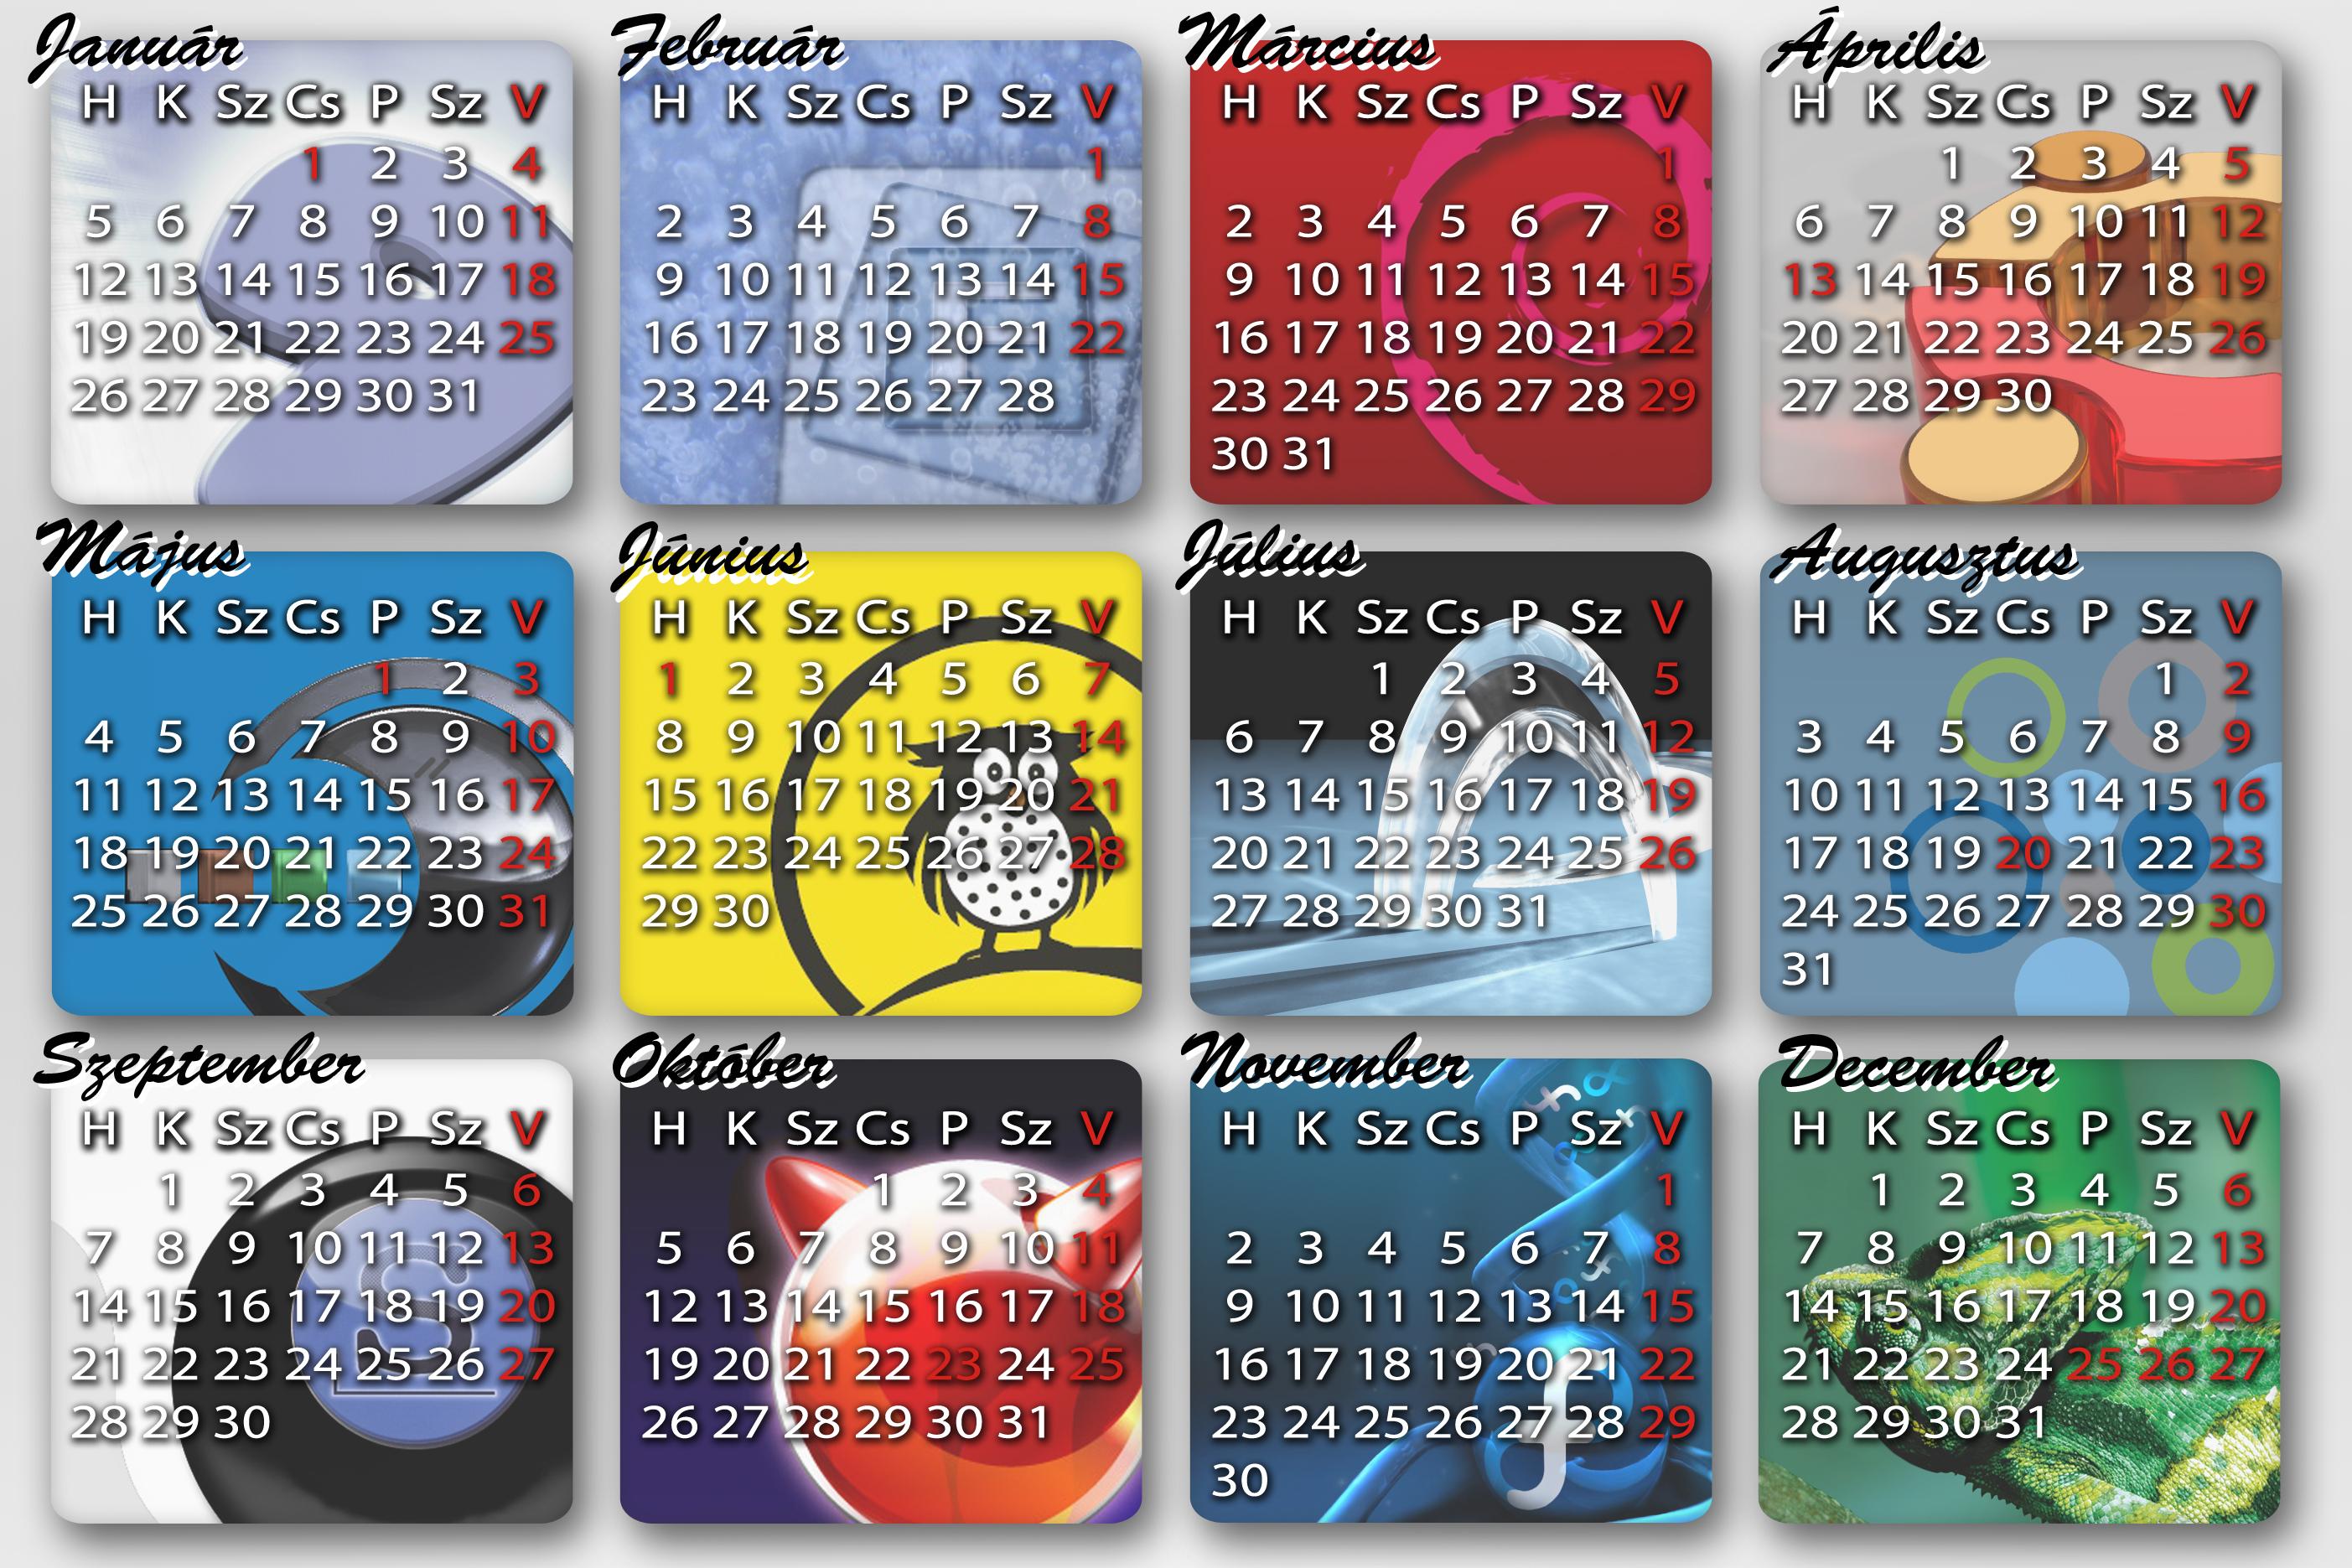 unix 2009 naptár Linux naptár | HUP unix 2009 naptár